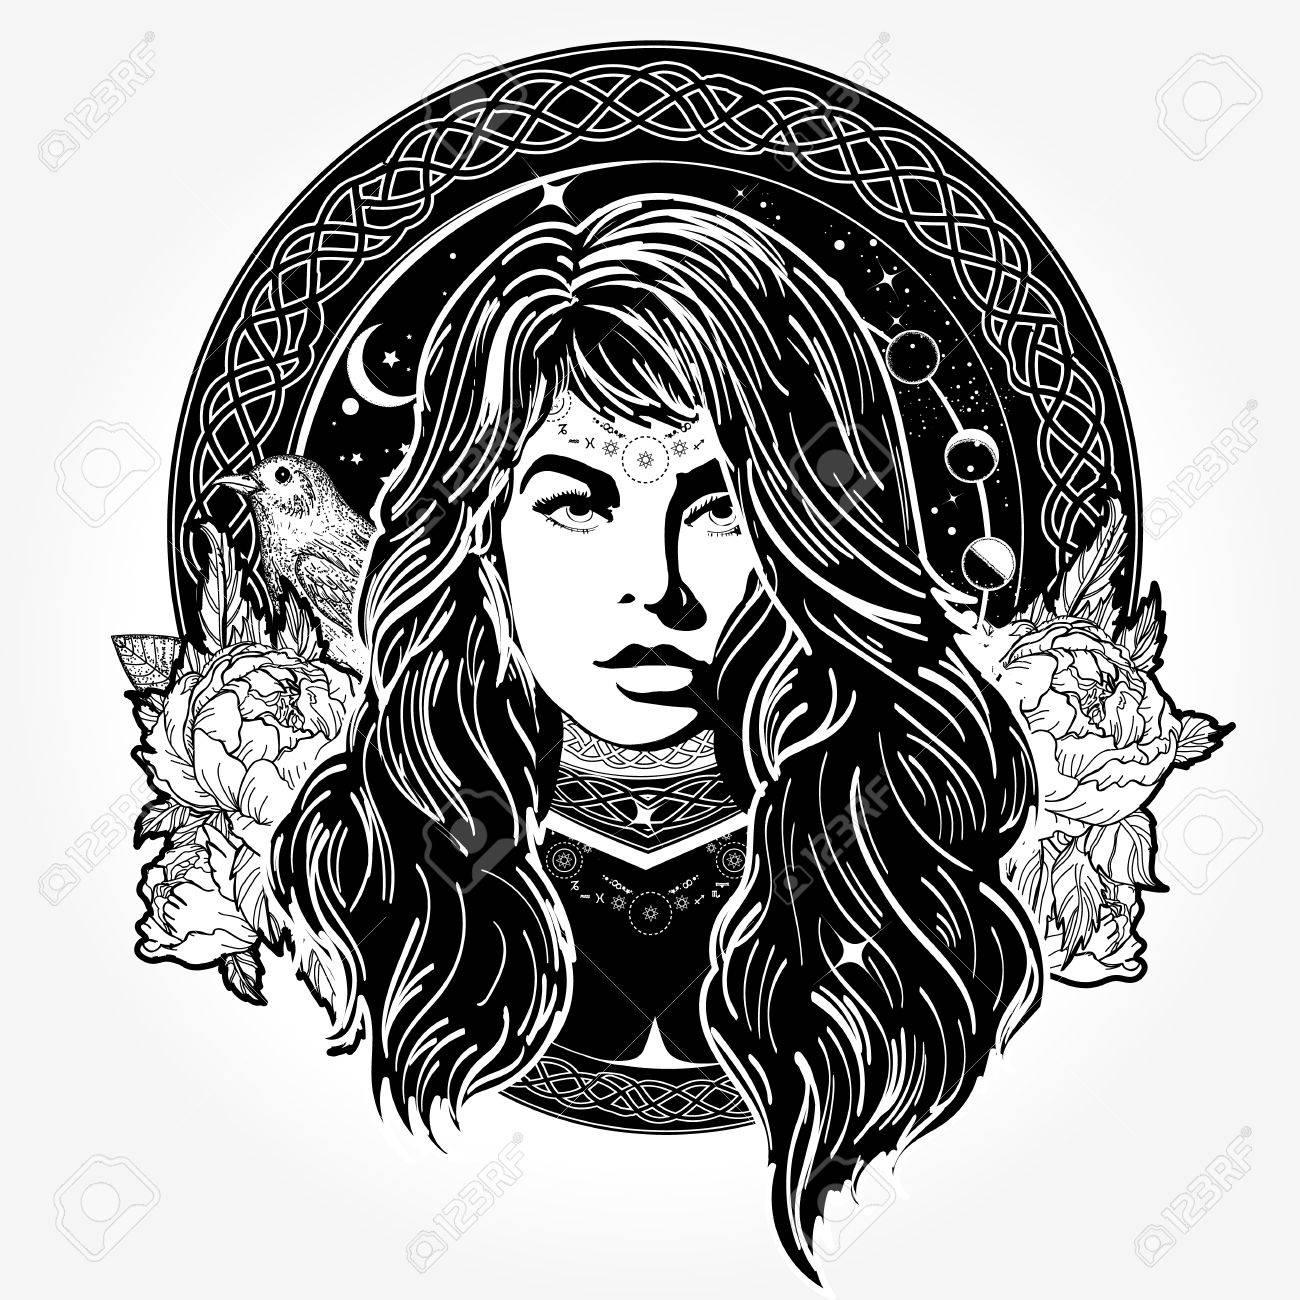 Magic woman tattoo and t-shirt design - 84742420